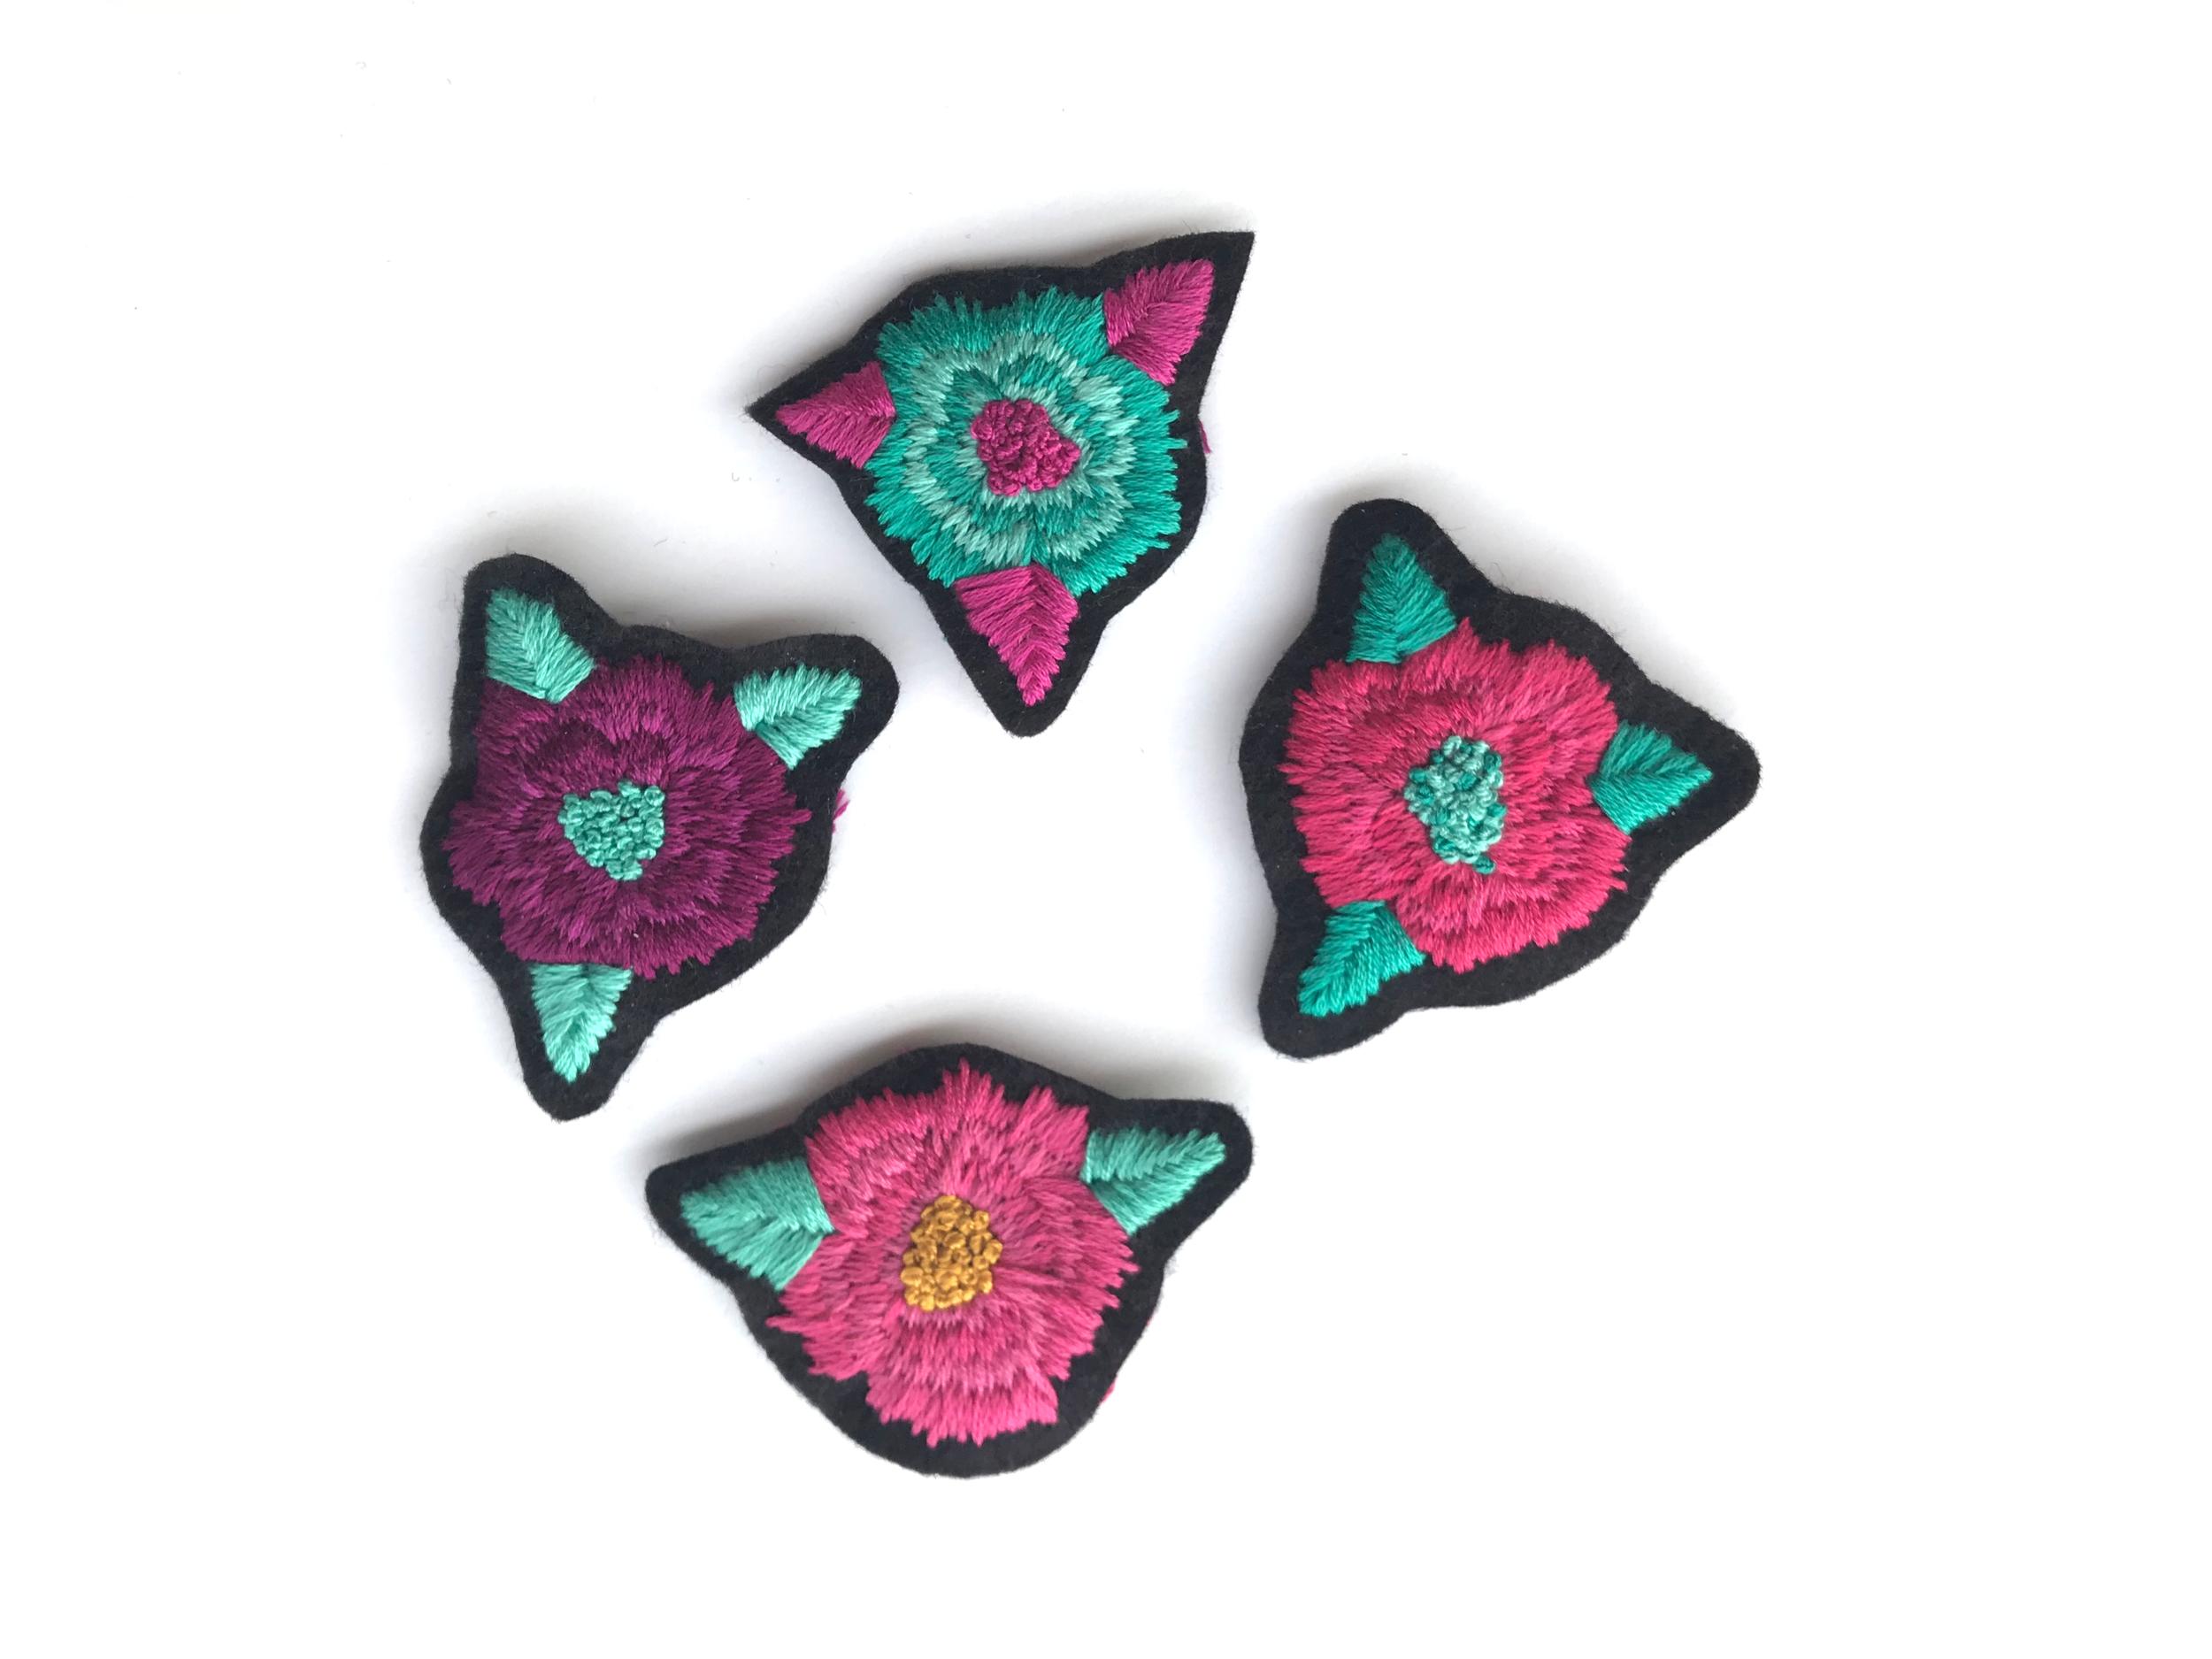 embroidery flower patch - arlene lorenzo art